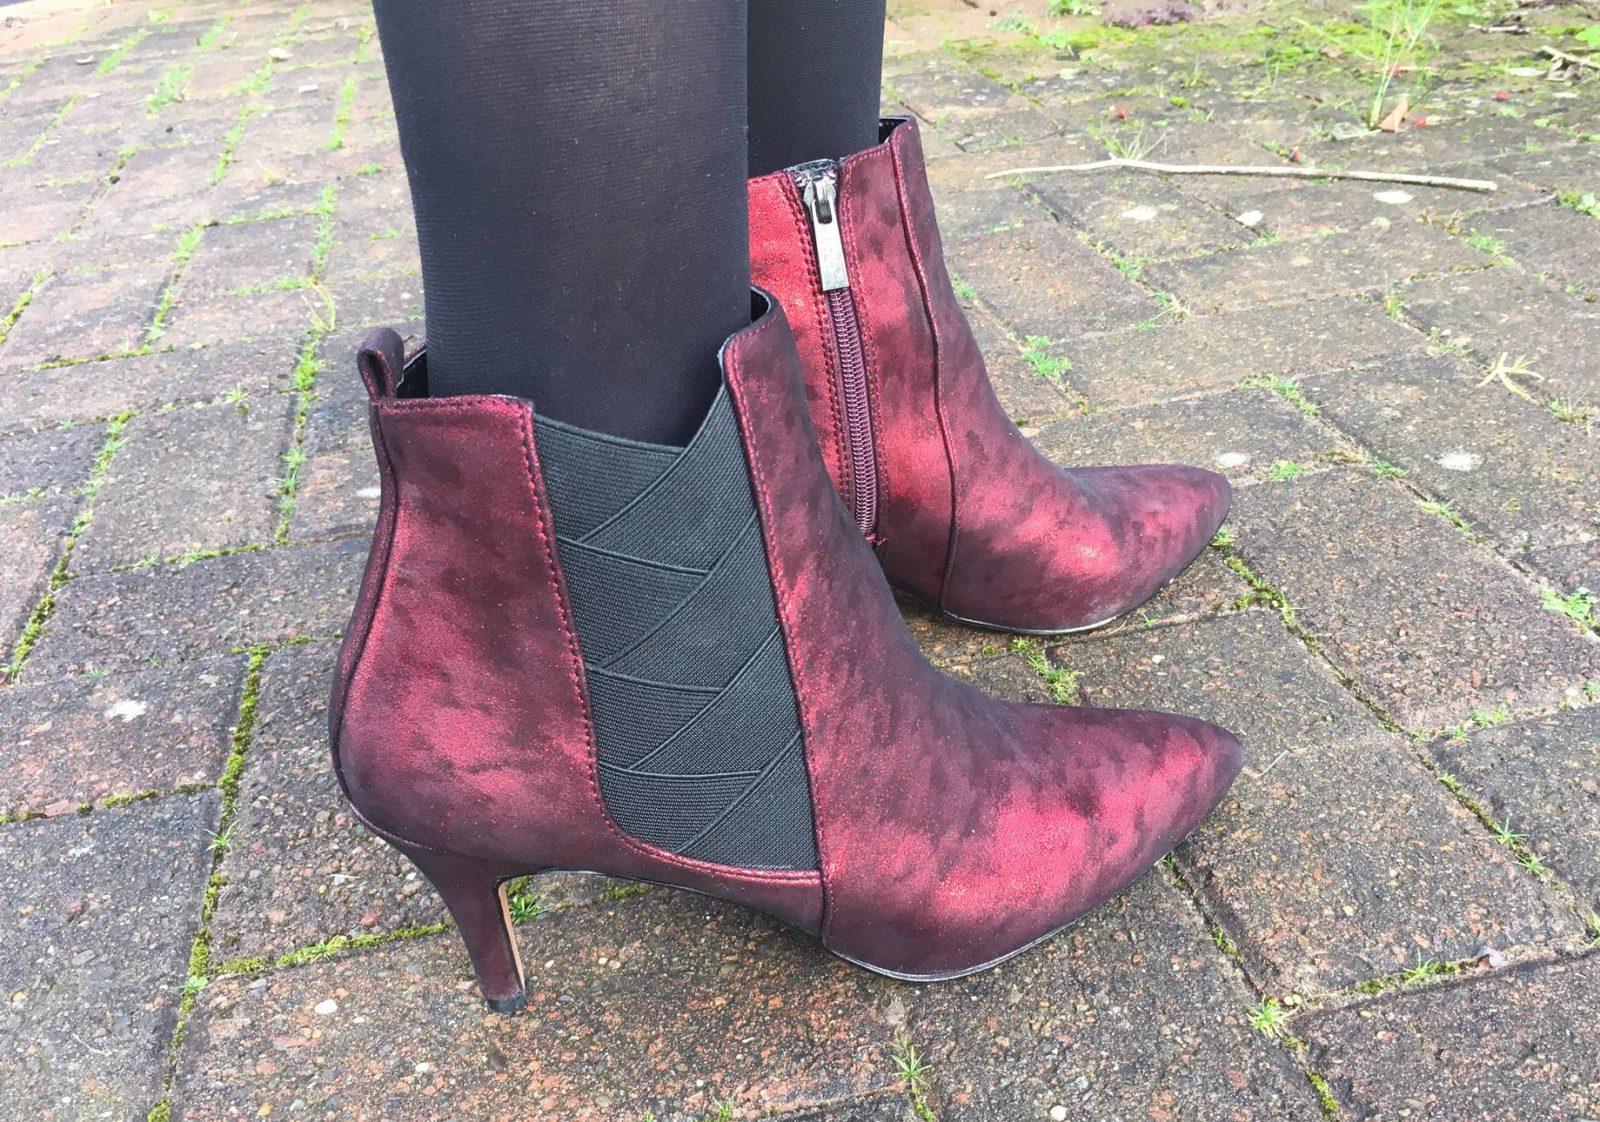 Lotus Booney redankle boots